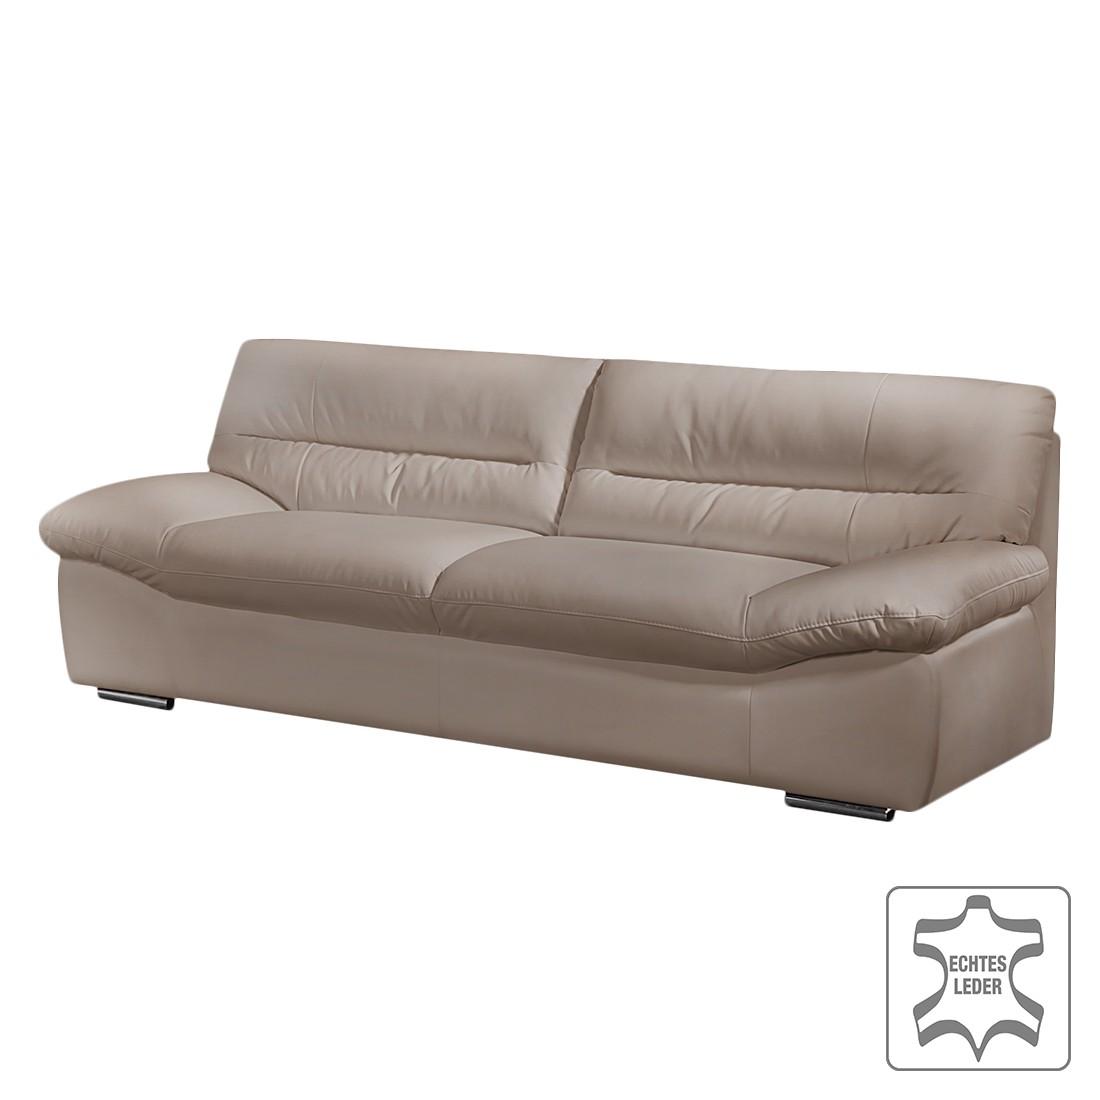 Echt leder 3 sitzer sofas preisvergleiche for Echtleder sofa